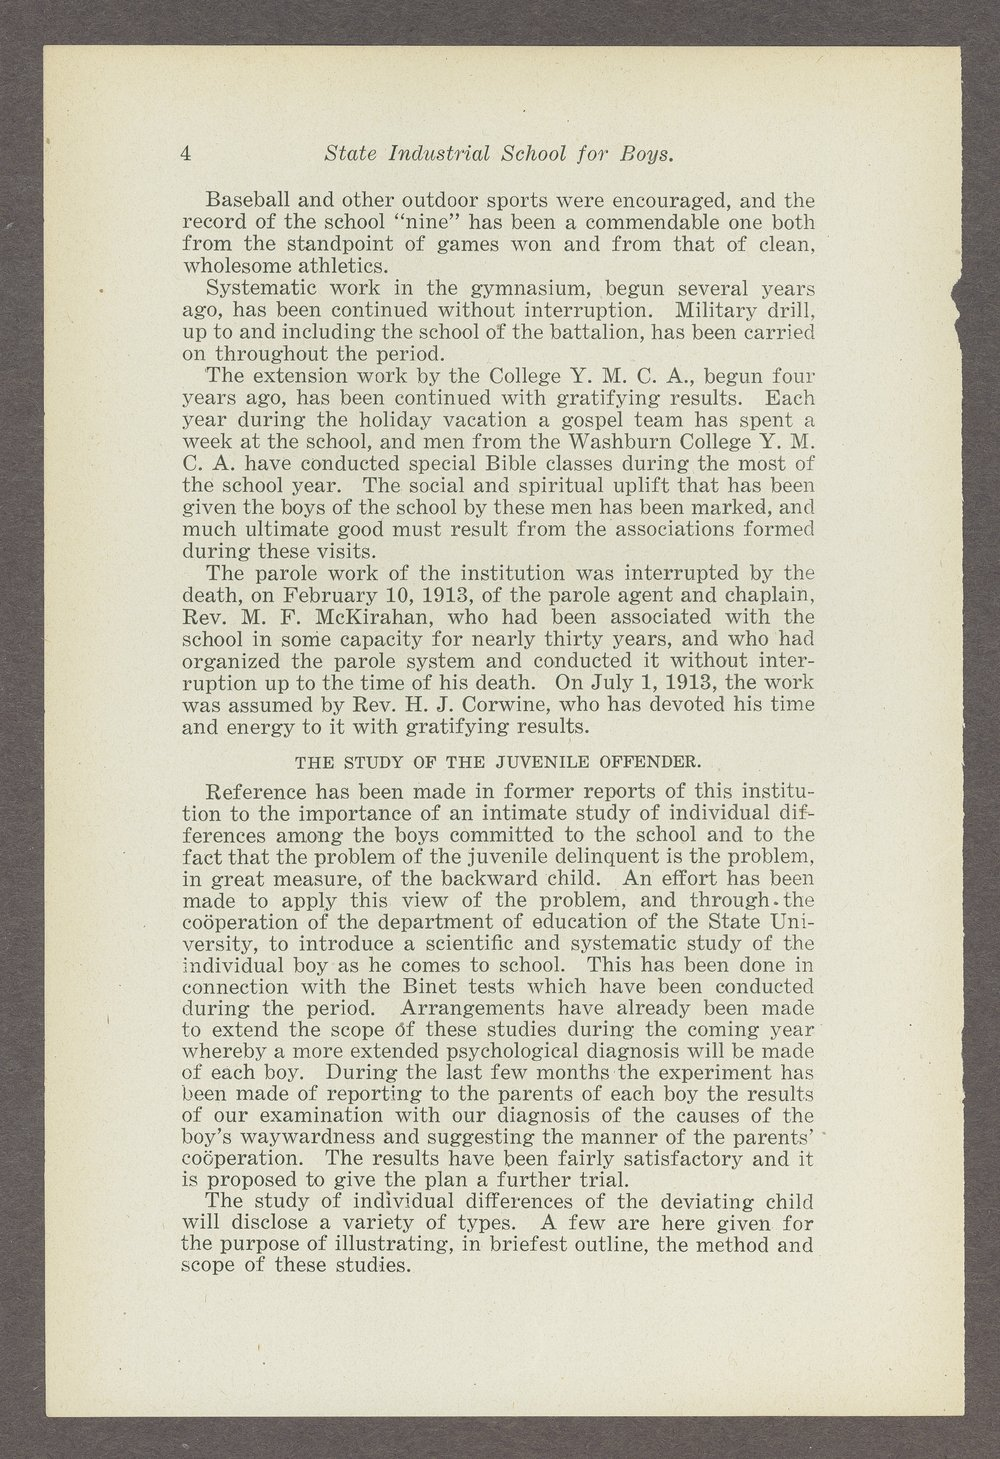 Biennial report of the Boys Industrial School, 1914 - 4